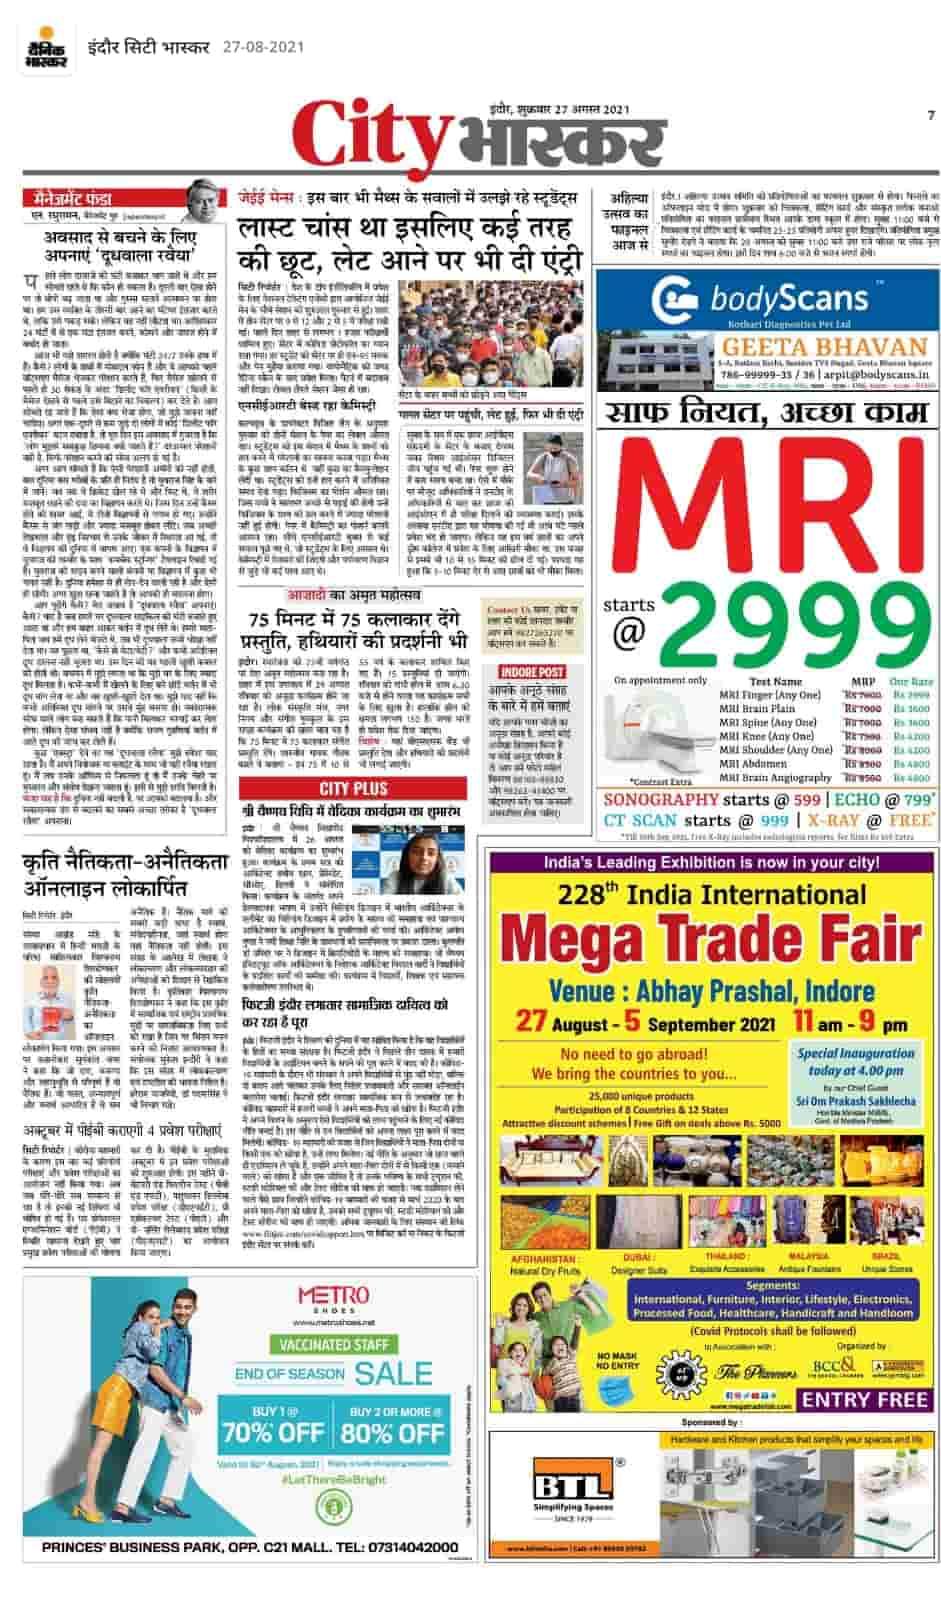 India International Mega Trade Fair Indore Newspaper Ad City Bhaskar